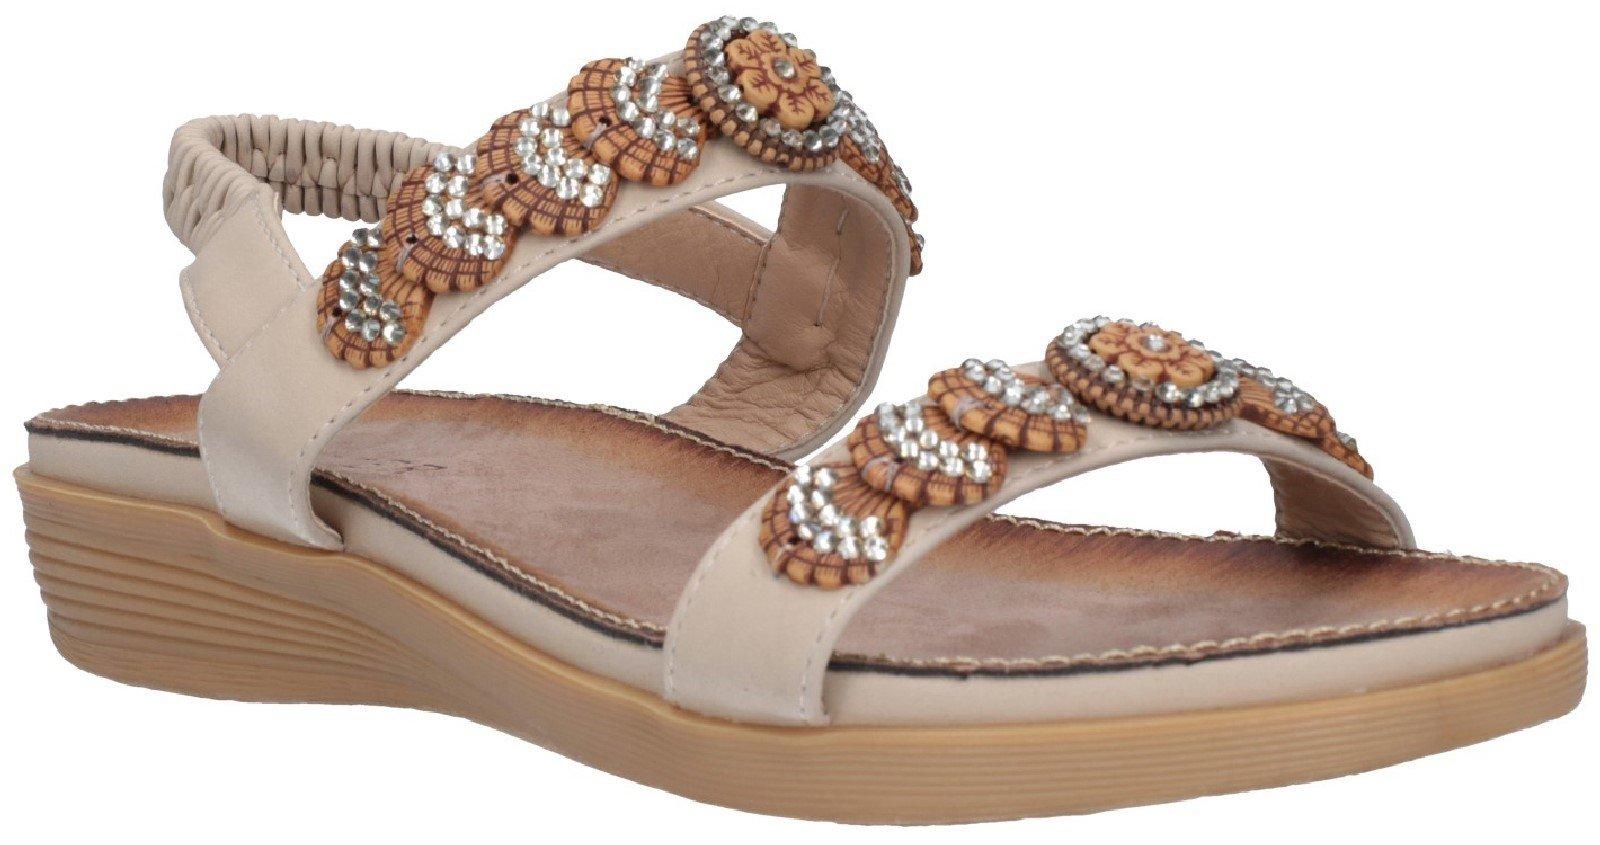 Fleet & Foster Women's Java Elasticated Sandal Various Colours 28280 - Beige 3